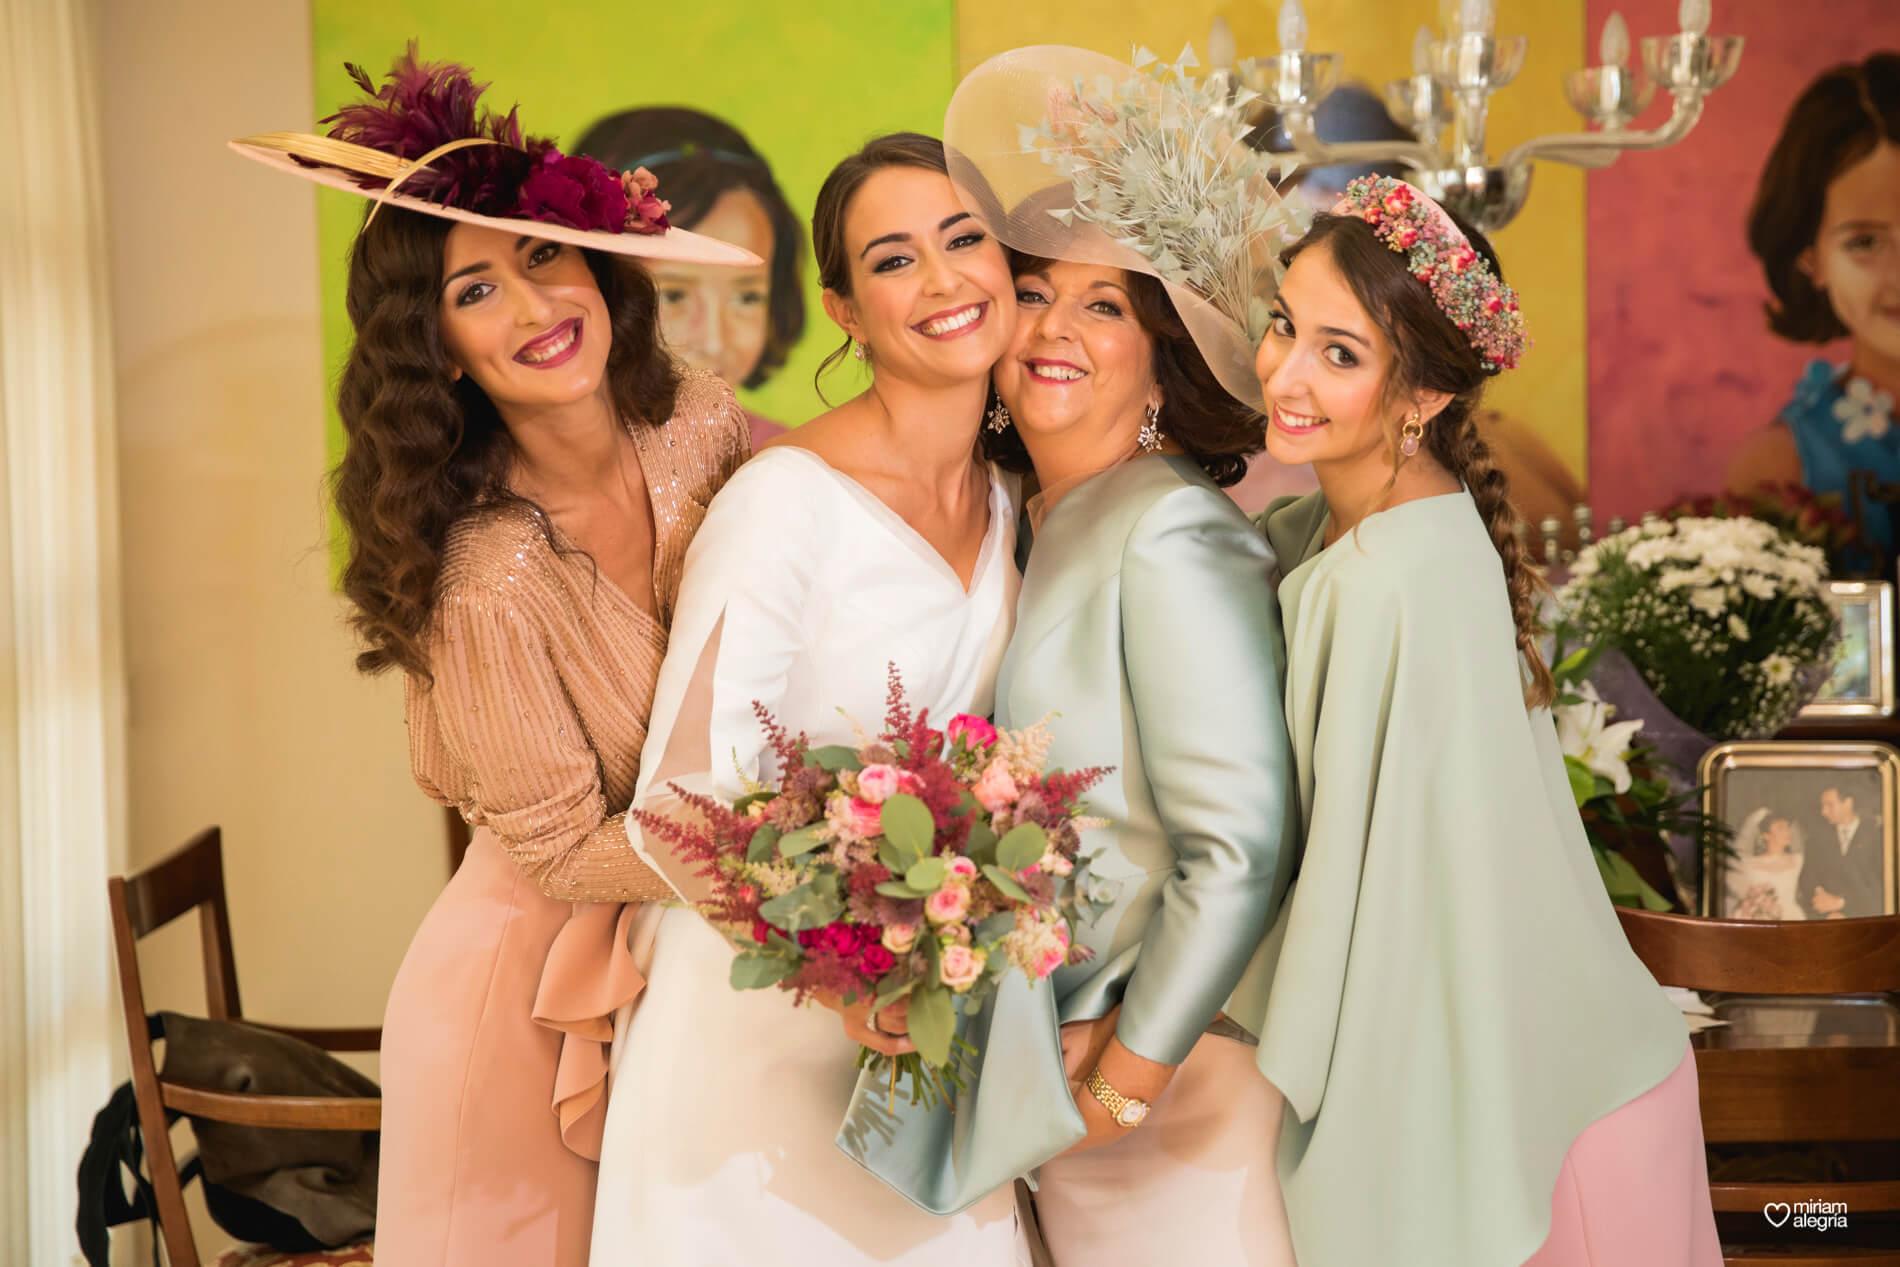 vestido-de-novia-paula-del-vas-miriam-alegria-fotografos-boda-murcia-38